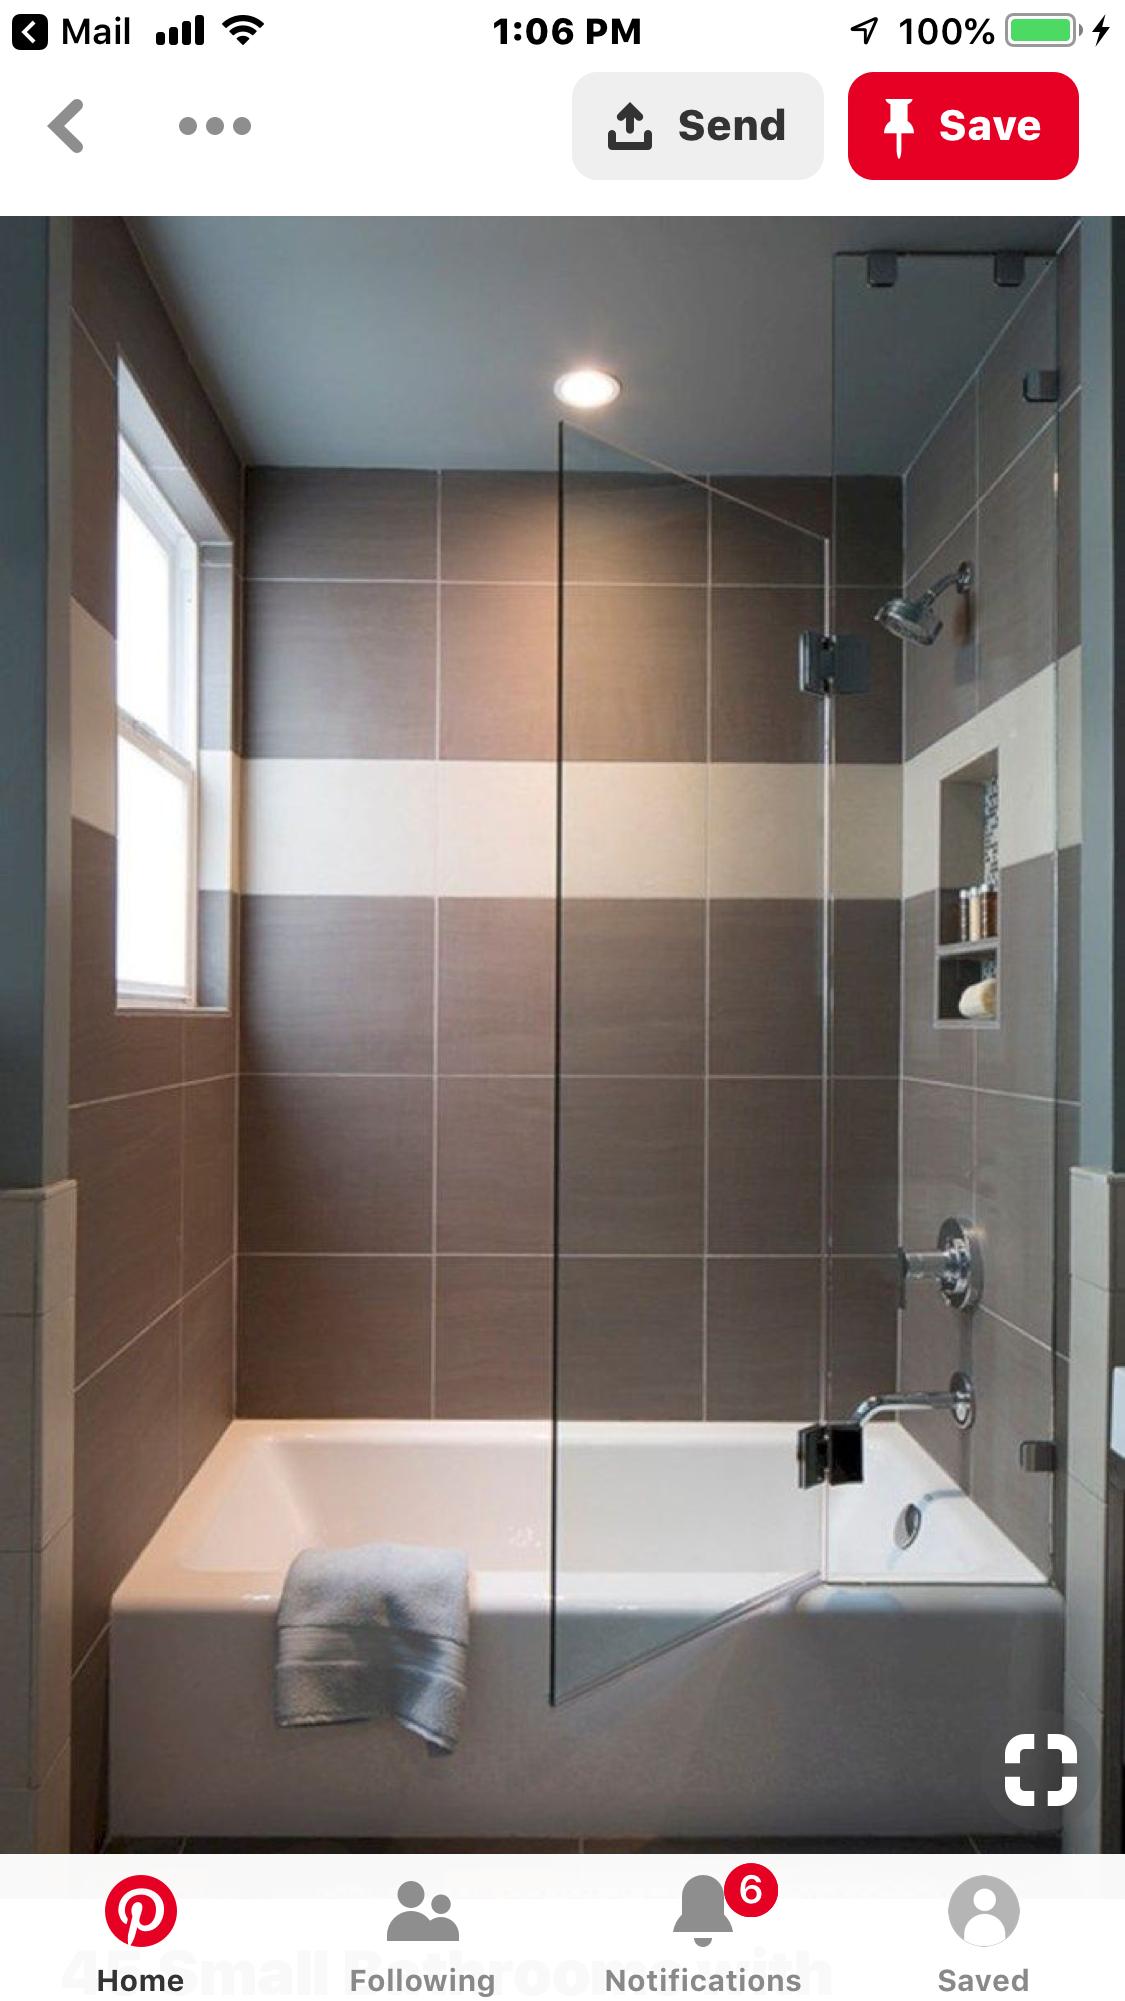 Pin By Julie Ann On East Walkout Bath Small Bathtub Small Bathroom Guest Bathroom Design